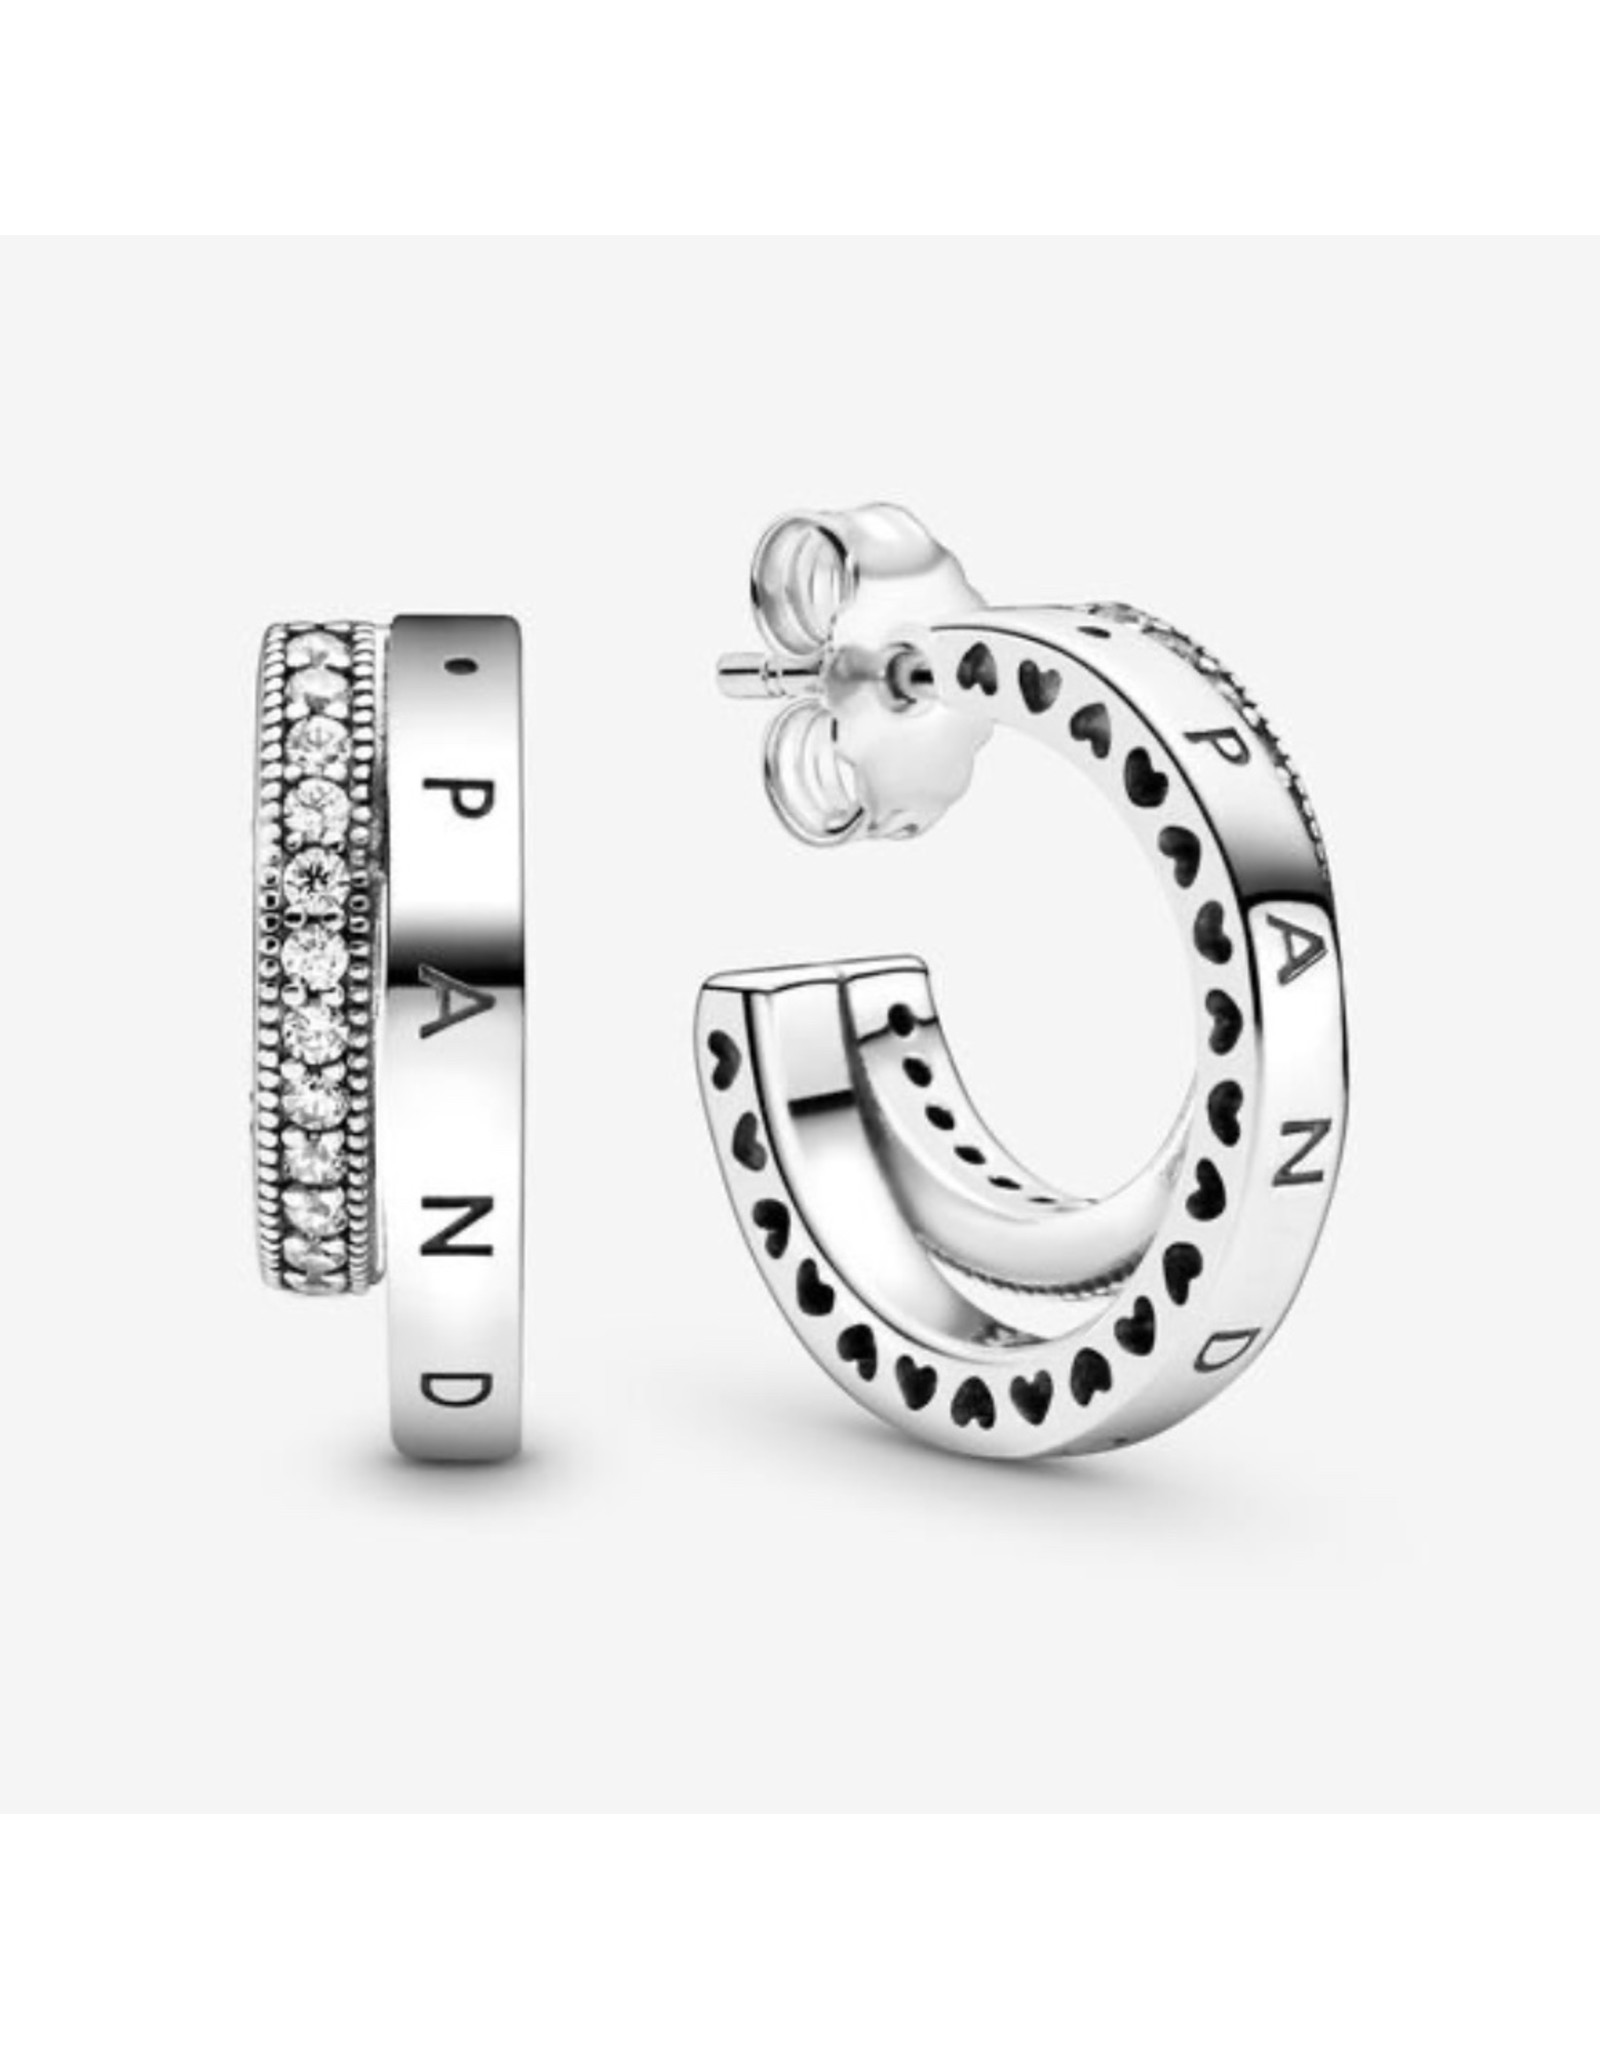 Pandora Pandora Signature Earrings, 299056C01,Sterling Silver Stud, Clear CZ